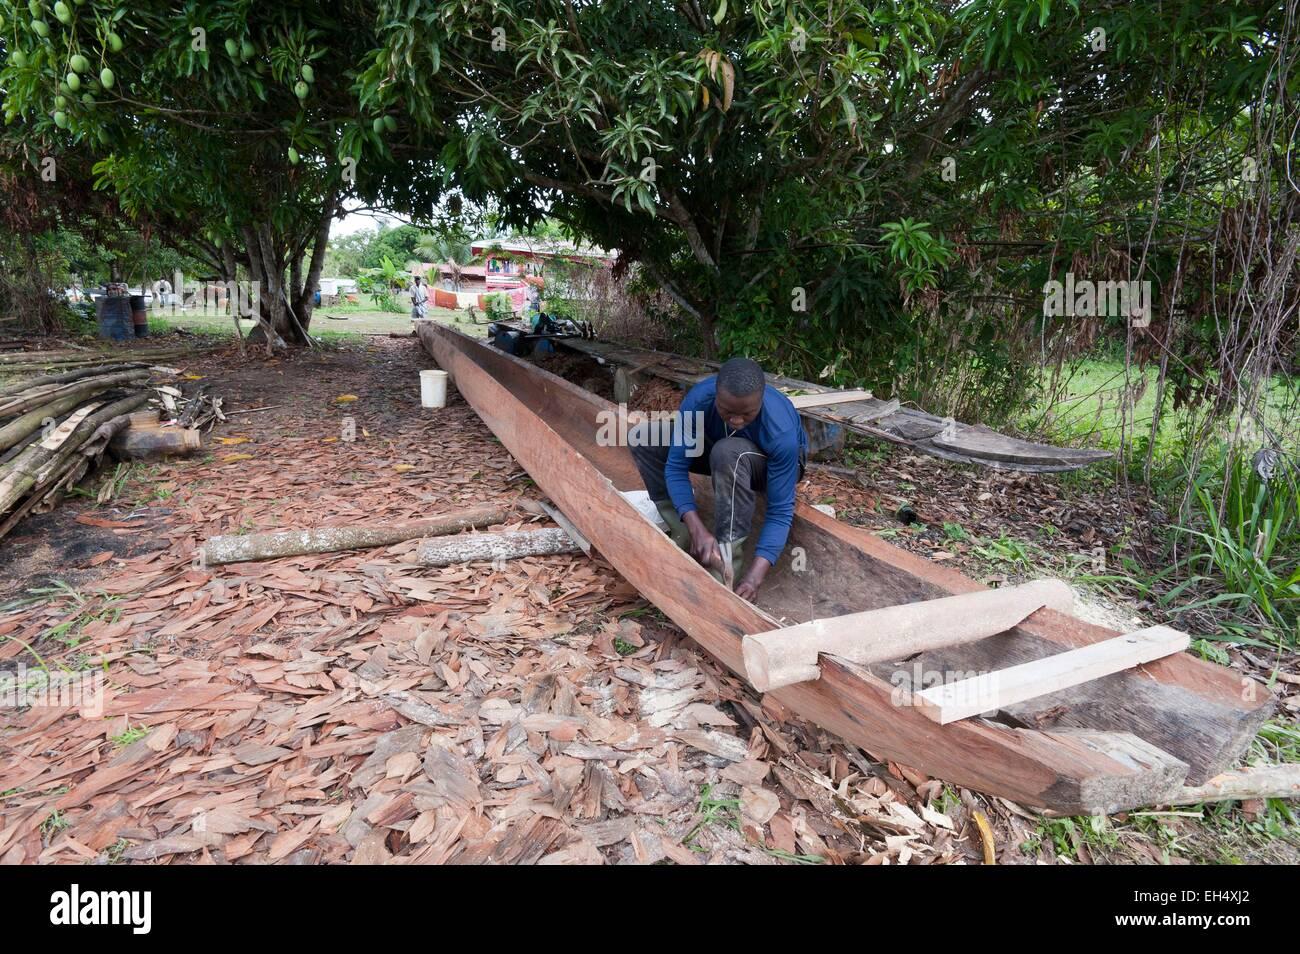 France, French Guiana, Parc Amazonien de Guyane (Guiana Amazonian Park), Providence, manufacturing a pirogue - Stock Image